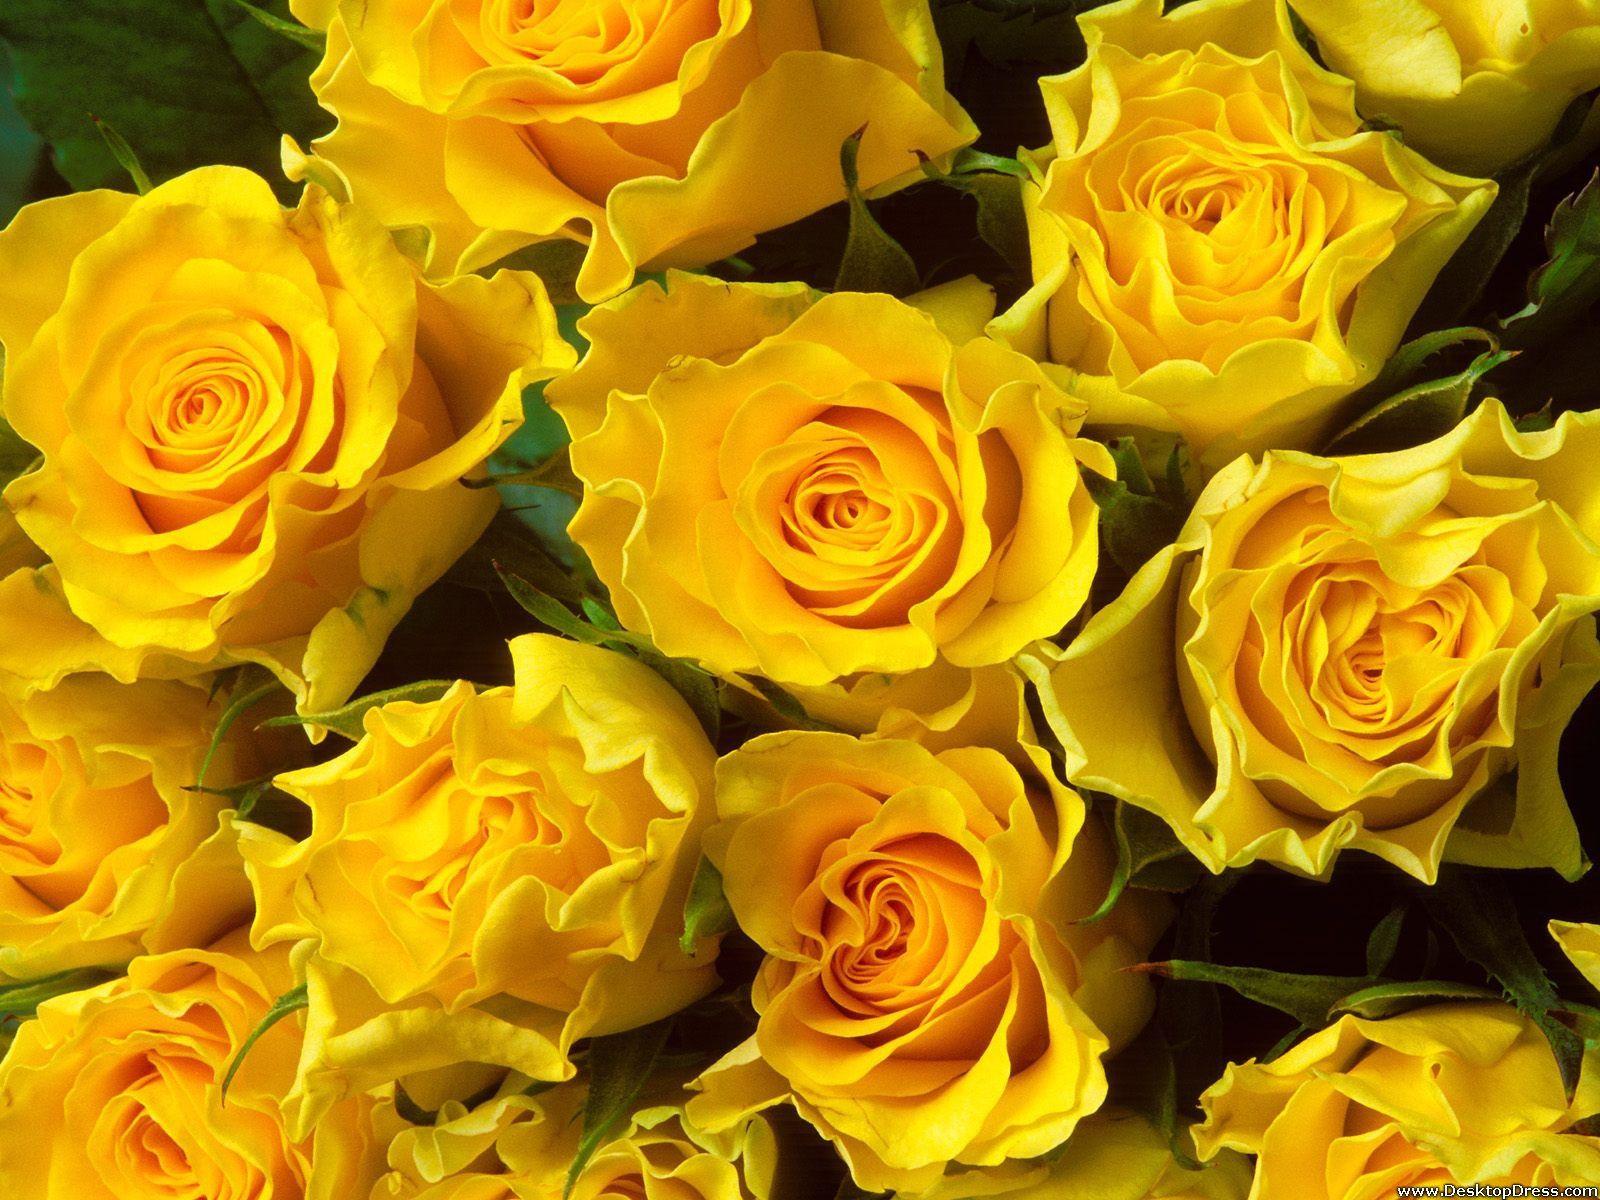 Hd wallpaper yellow rose - Yellow Rose Backgrounds Wallpaper Hd Wallpapers Pinterest Hd Wallpaper And Wallpaper